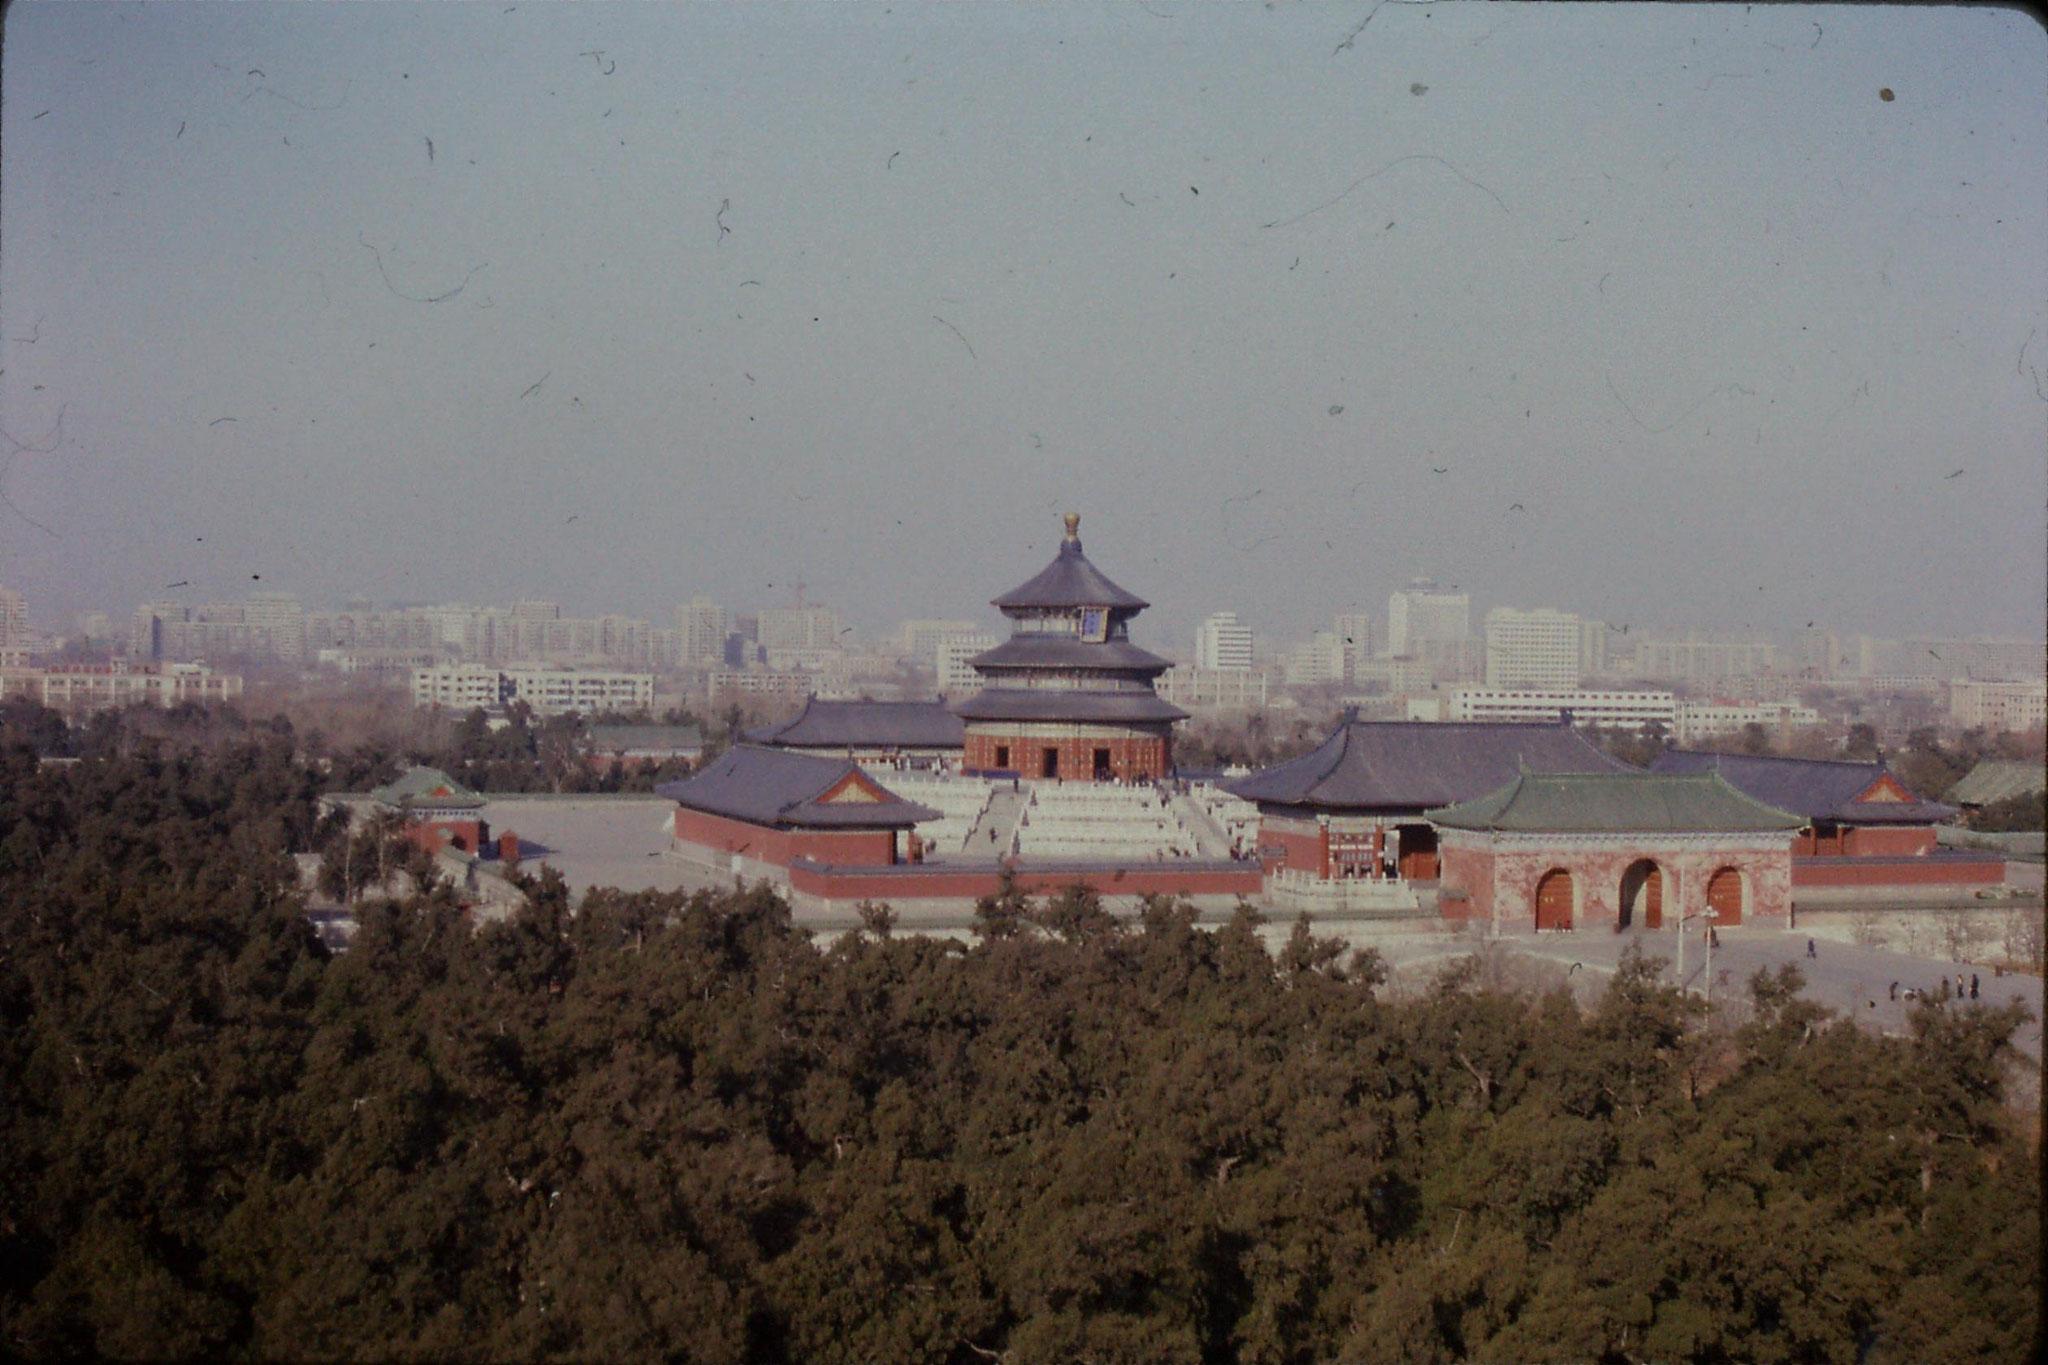 2/12/1988: 21: Tiantan Park